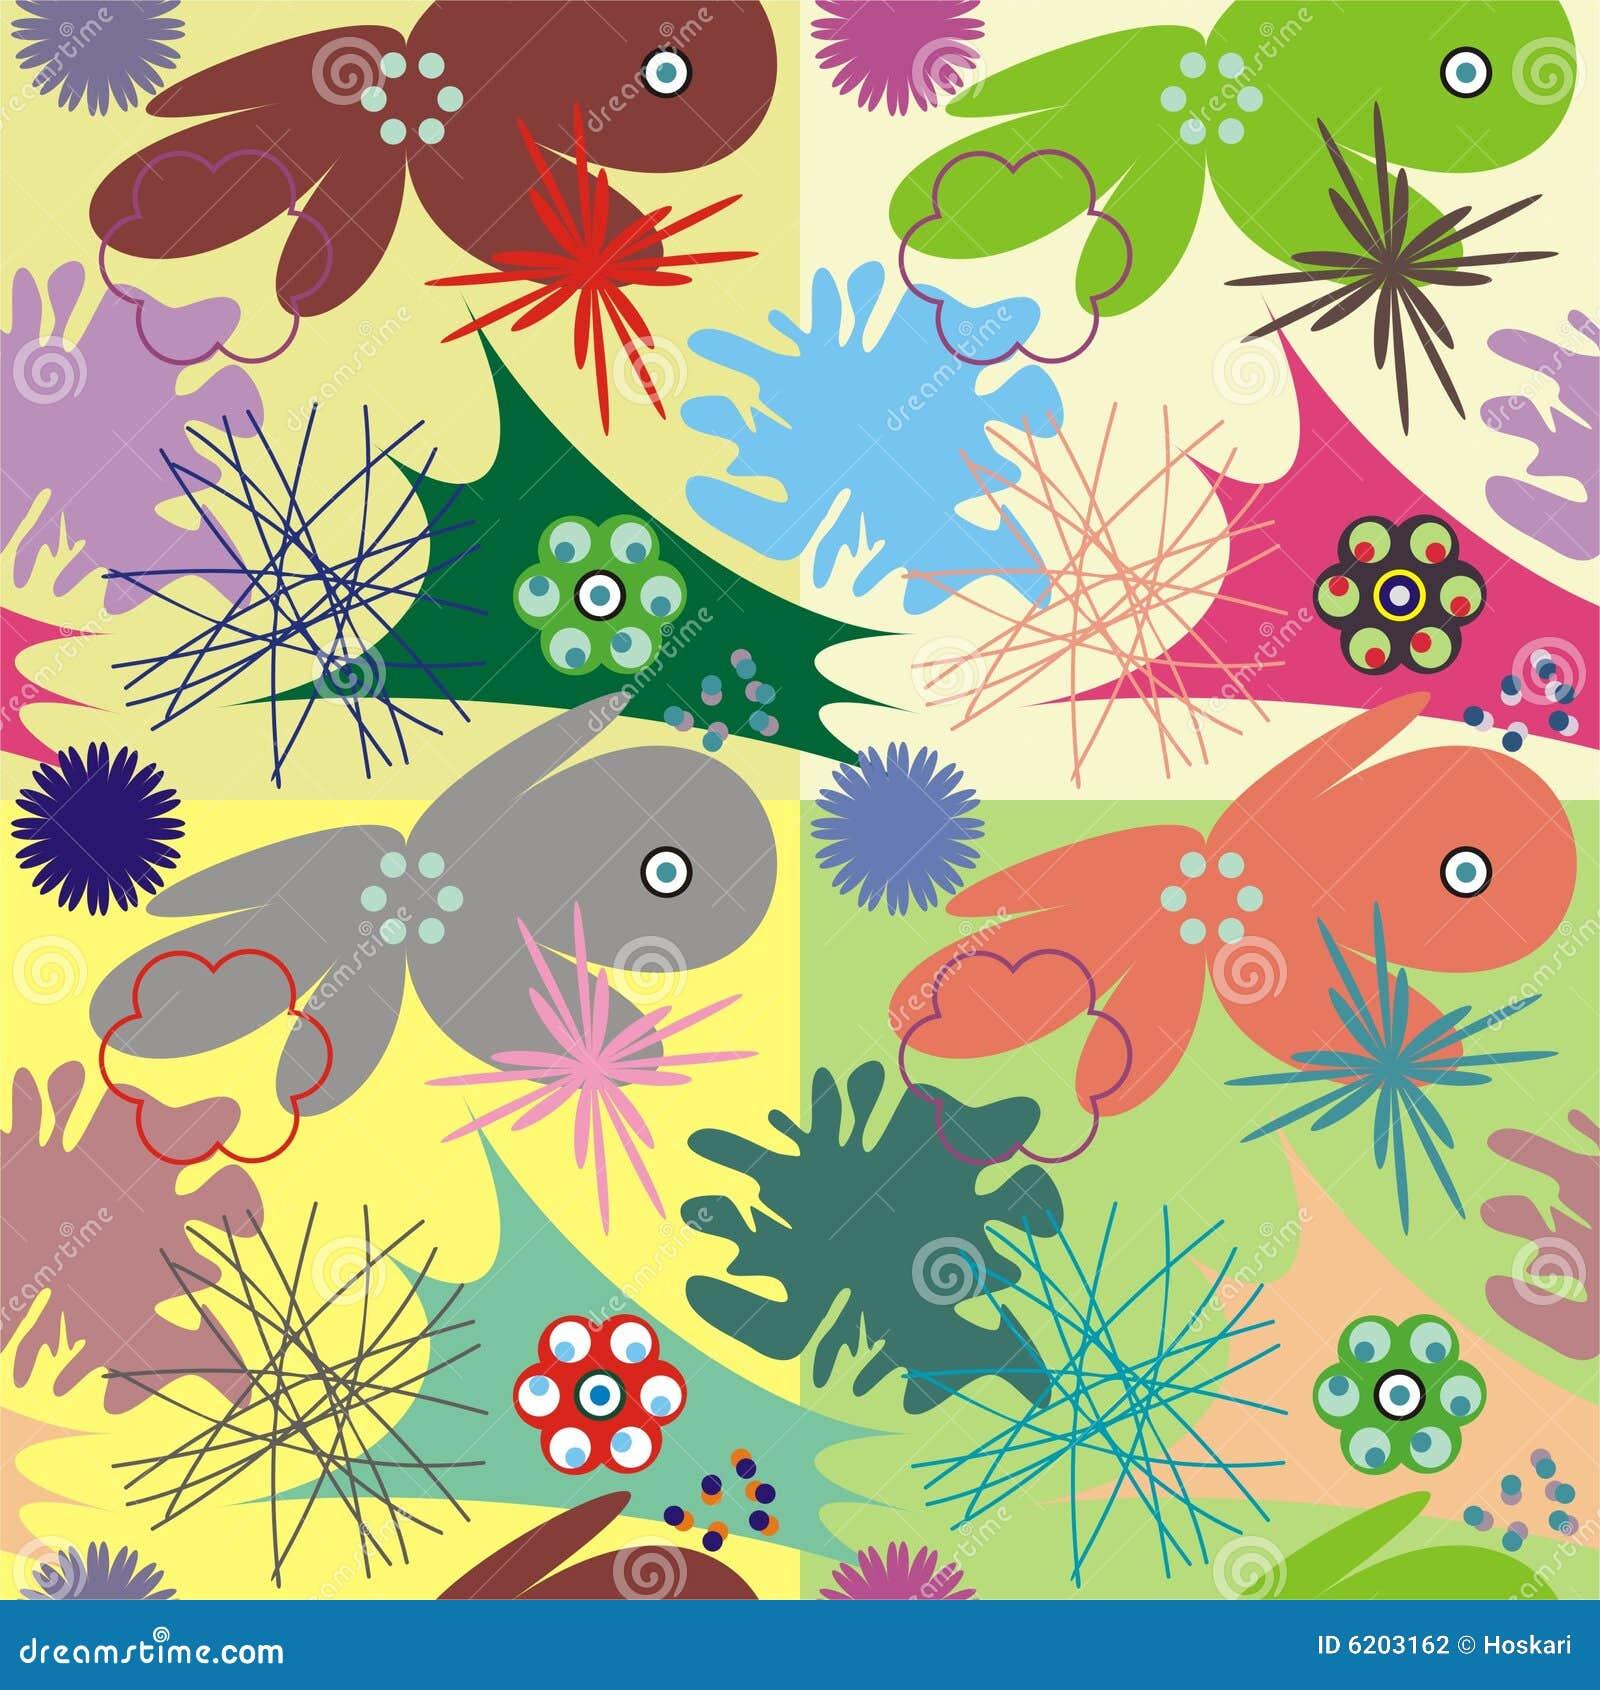 Dekorative Fliese mit Mikroorganismus